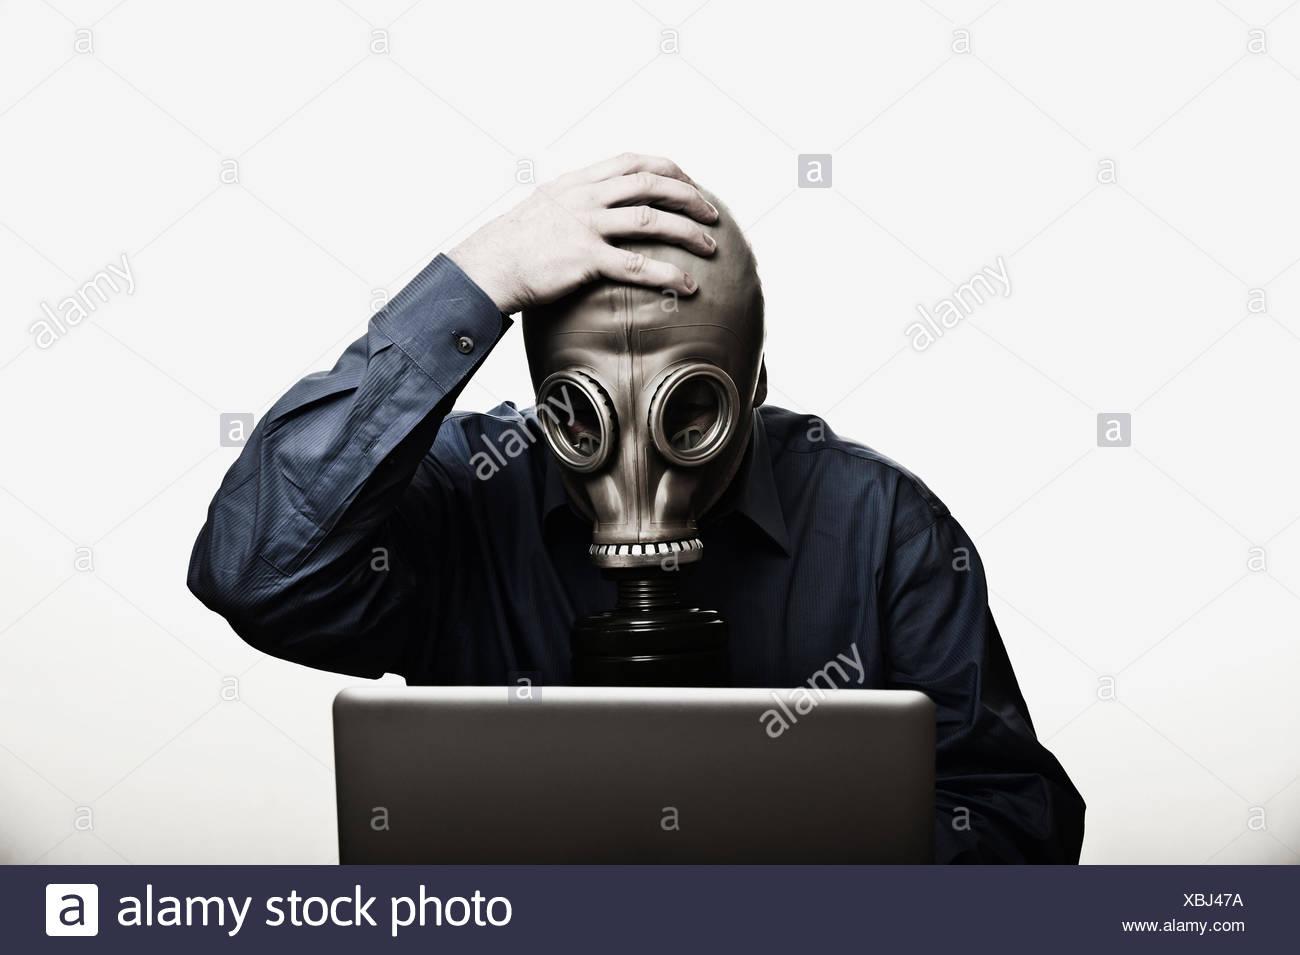 Studio shot of man in front of laptop wearing gas mask - Stock Image